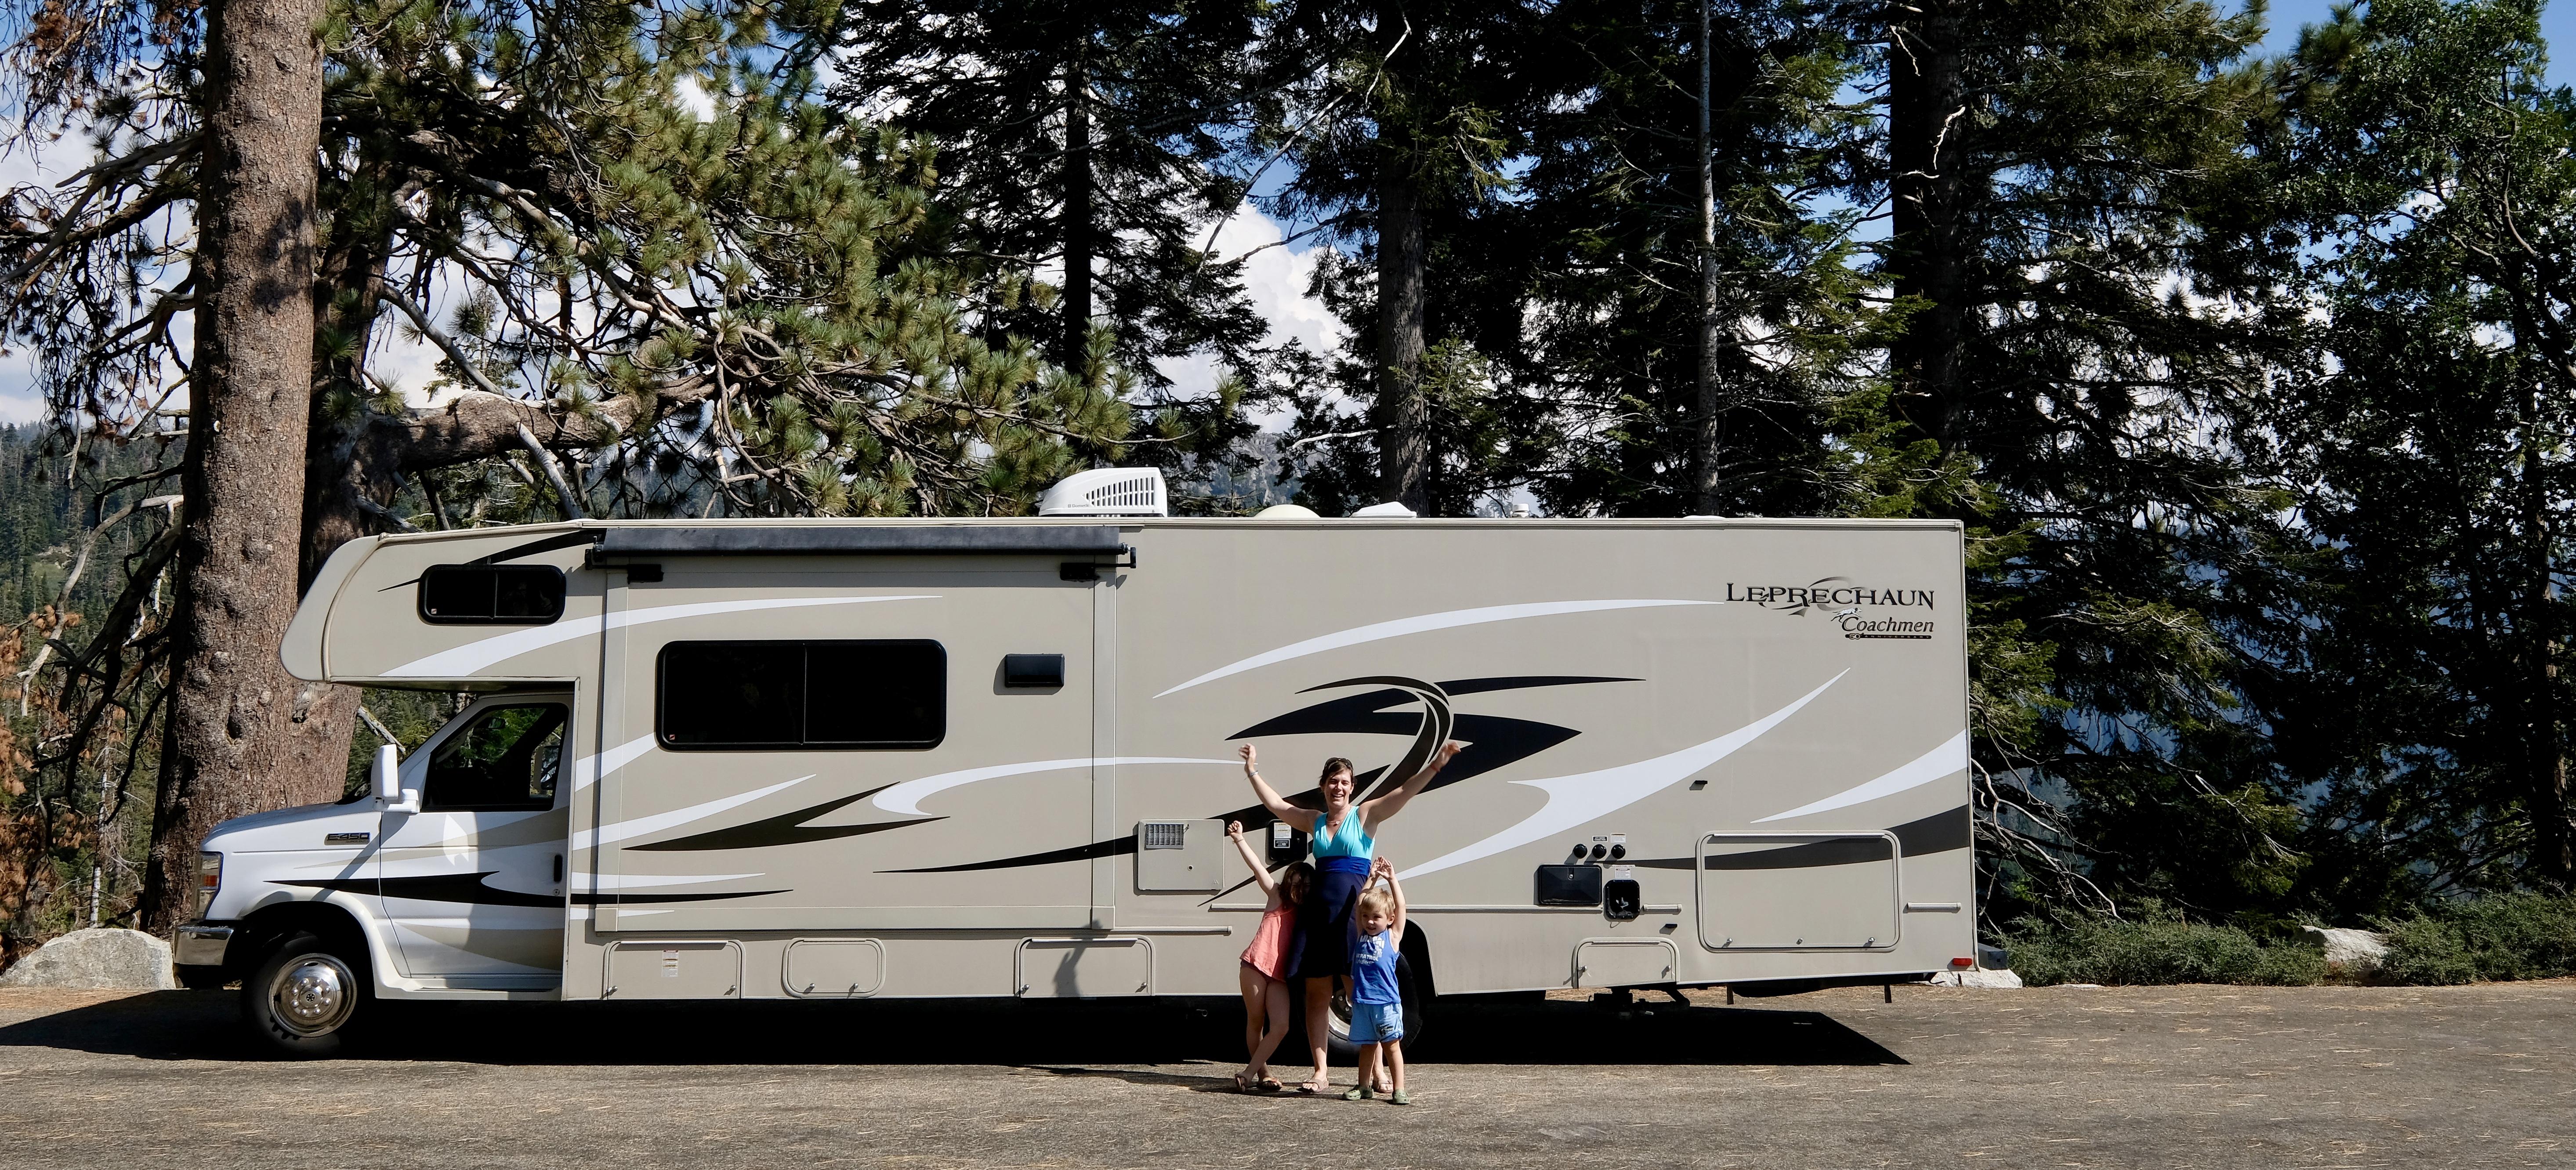 Sequoia Park - our RV